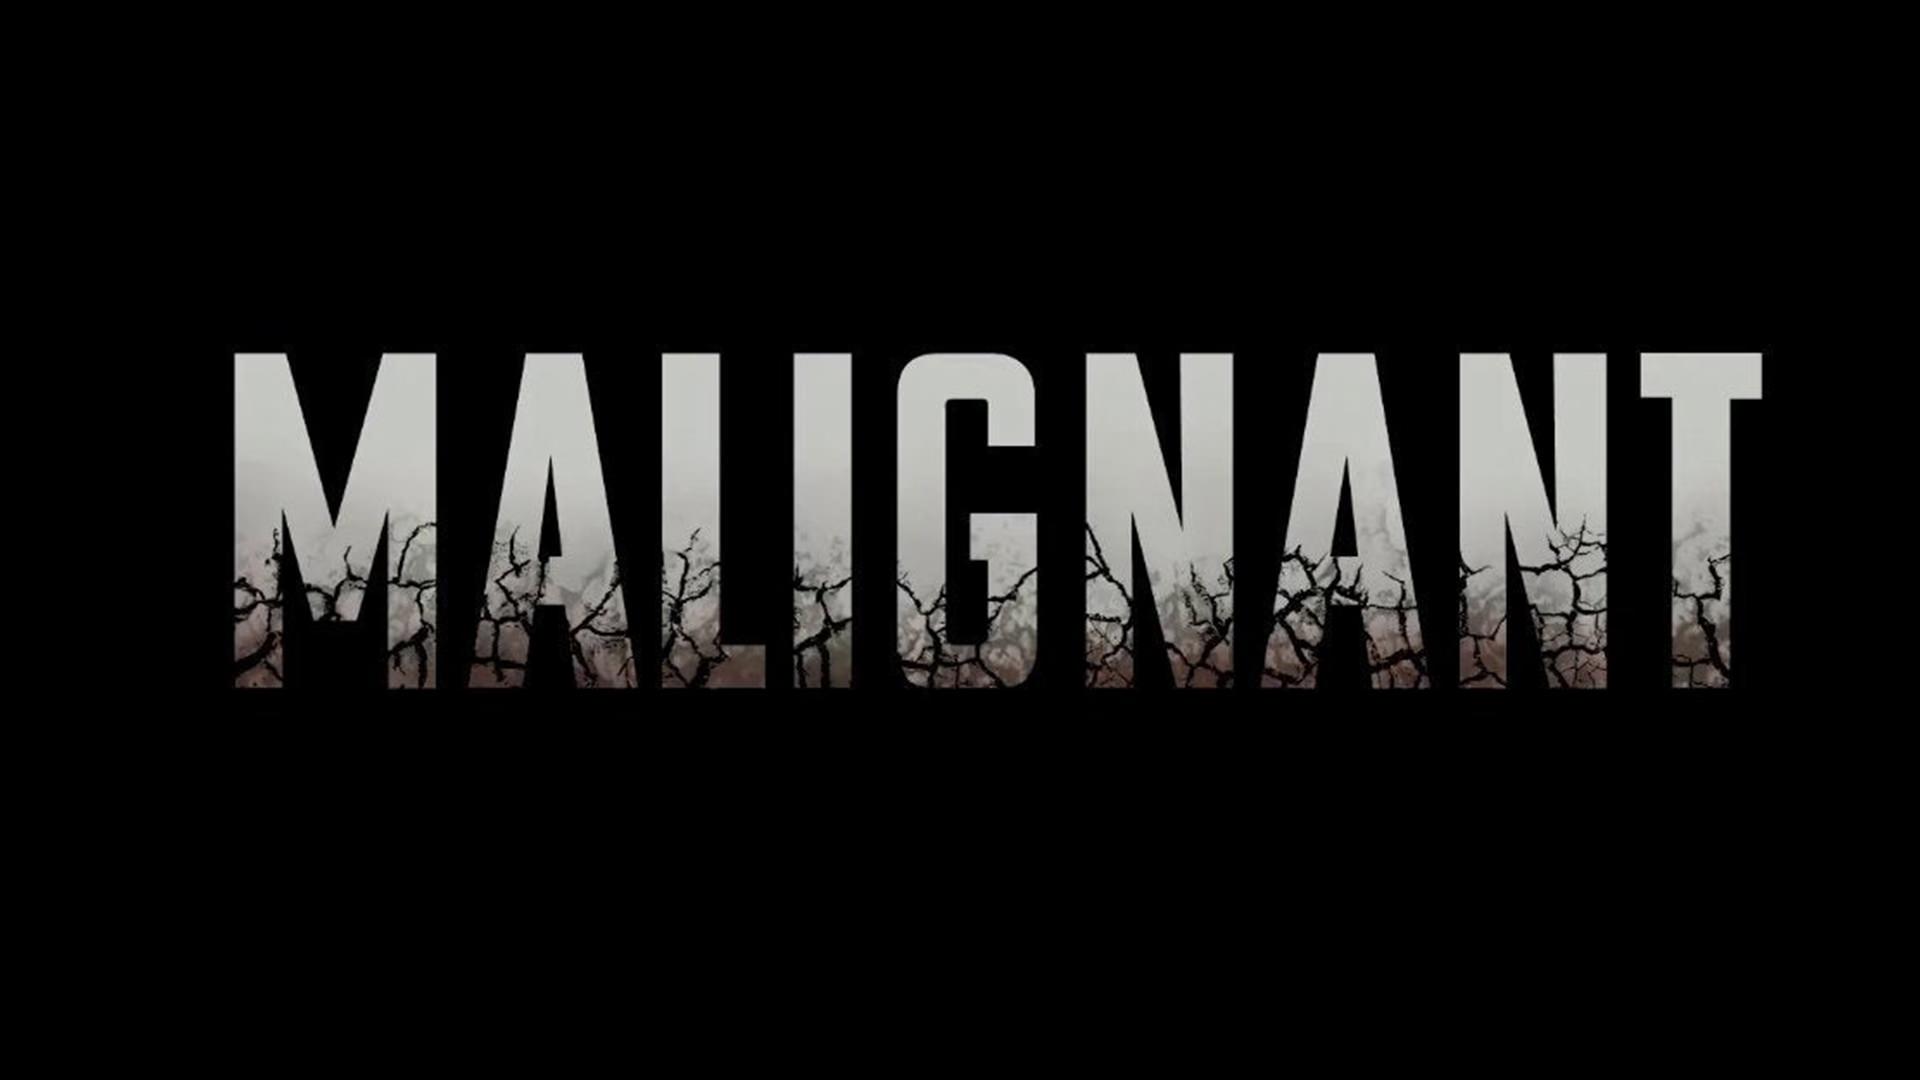 اعلام تاریخ اکران فیلم ترسناک جدید کارگردان The Conjuring؛ انتشار تصویر جدید